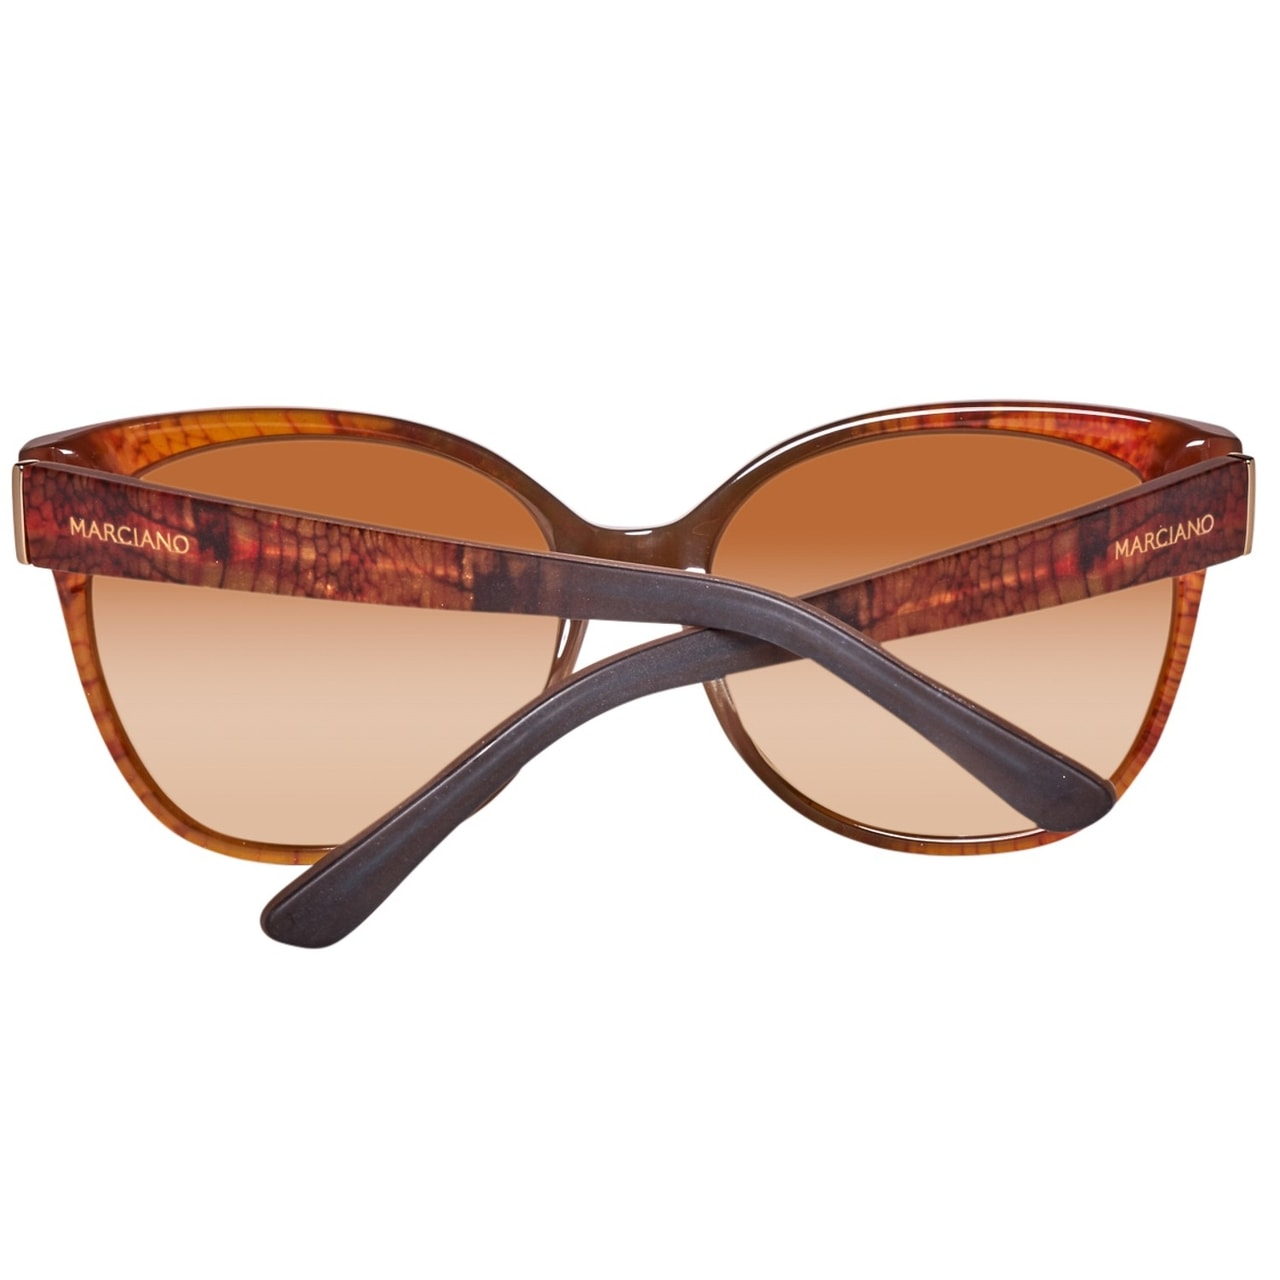 5681d0977 Glamadise.sk - Guess by Marciano slnečné okuliare hnedé - Guess by ...